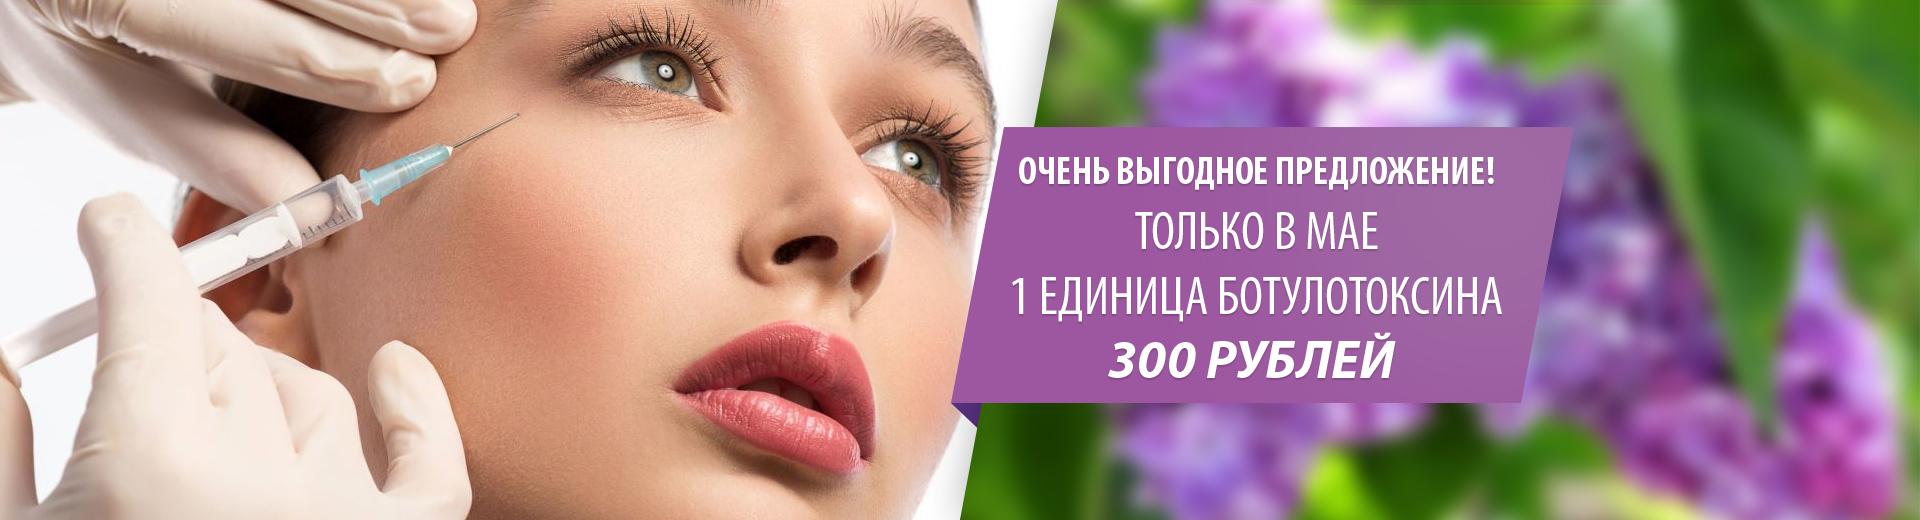 1 единица ботулотоксина - 300 рублей